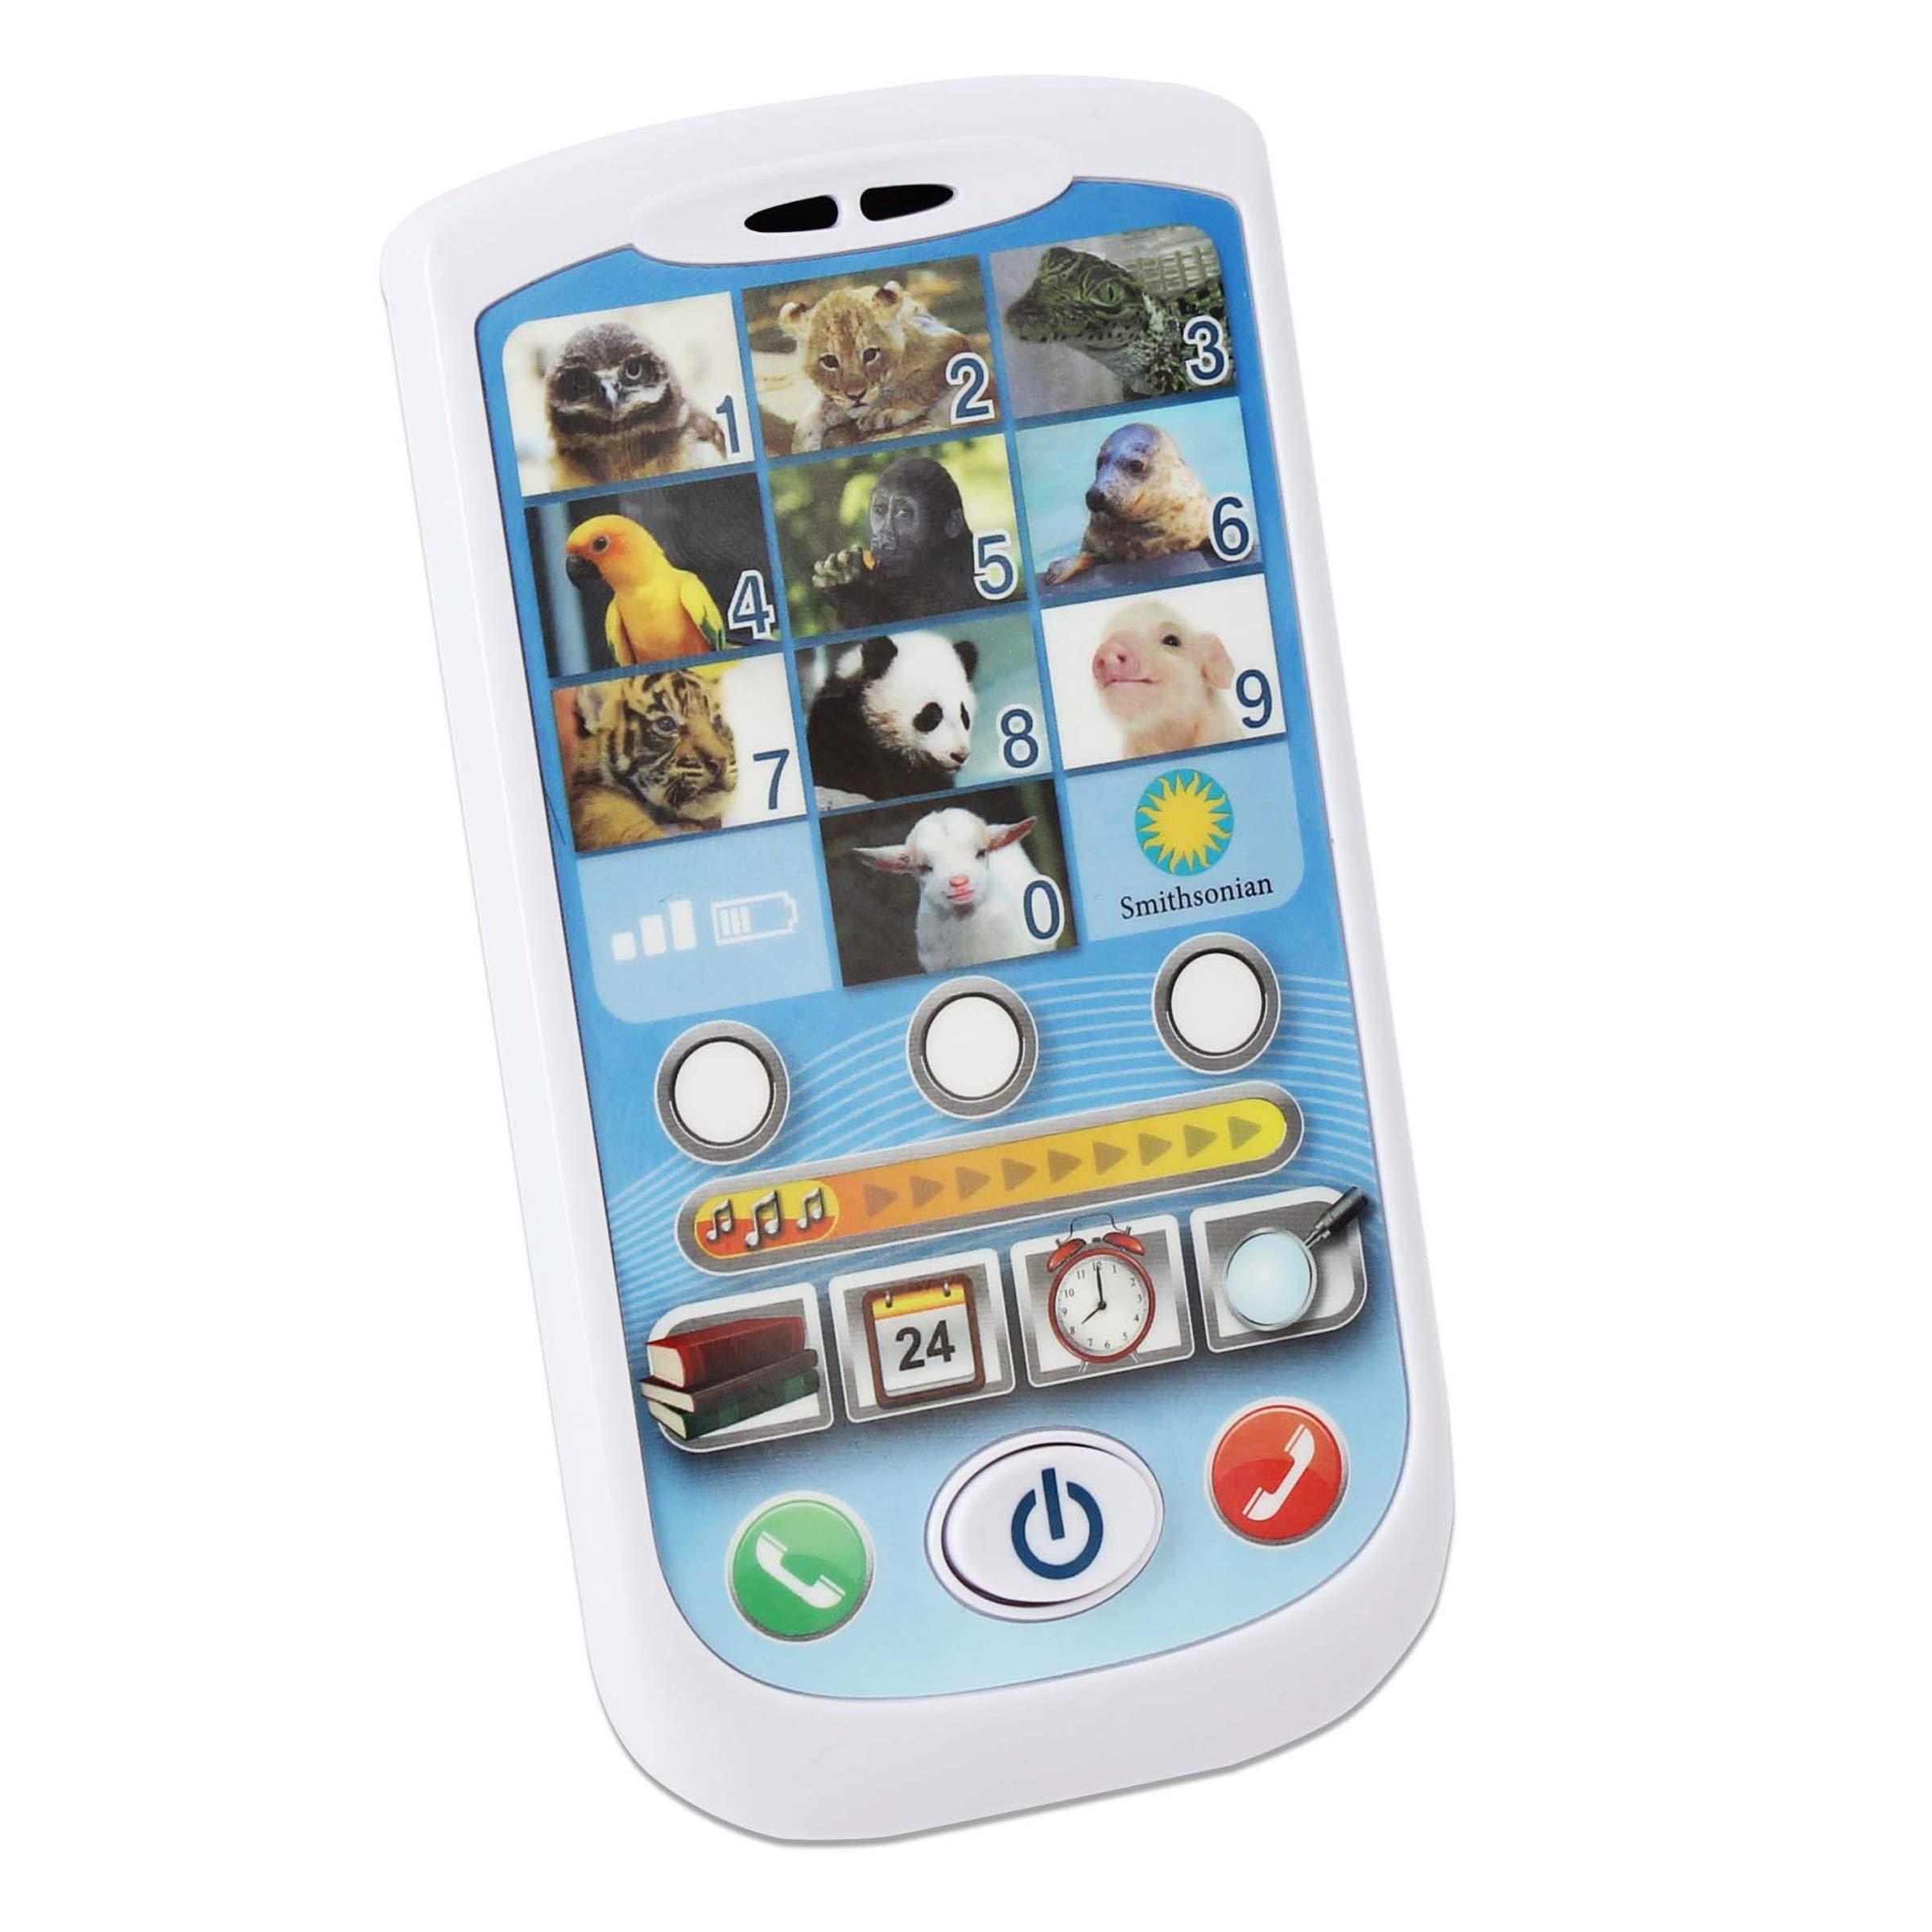 Kidz Delight Smithsonian Smart Phone Toy by KD Kids